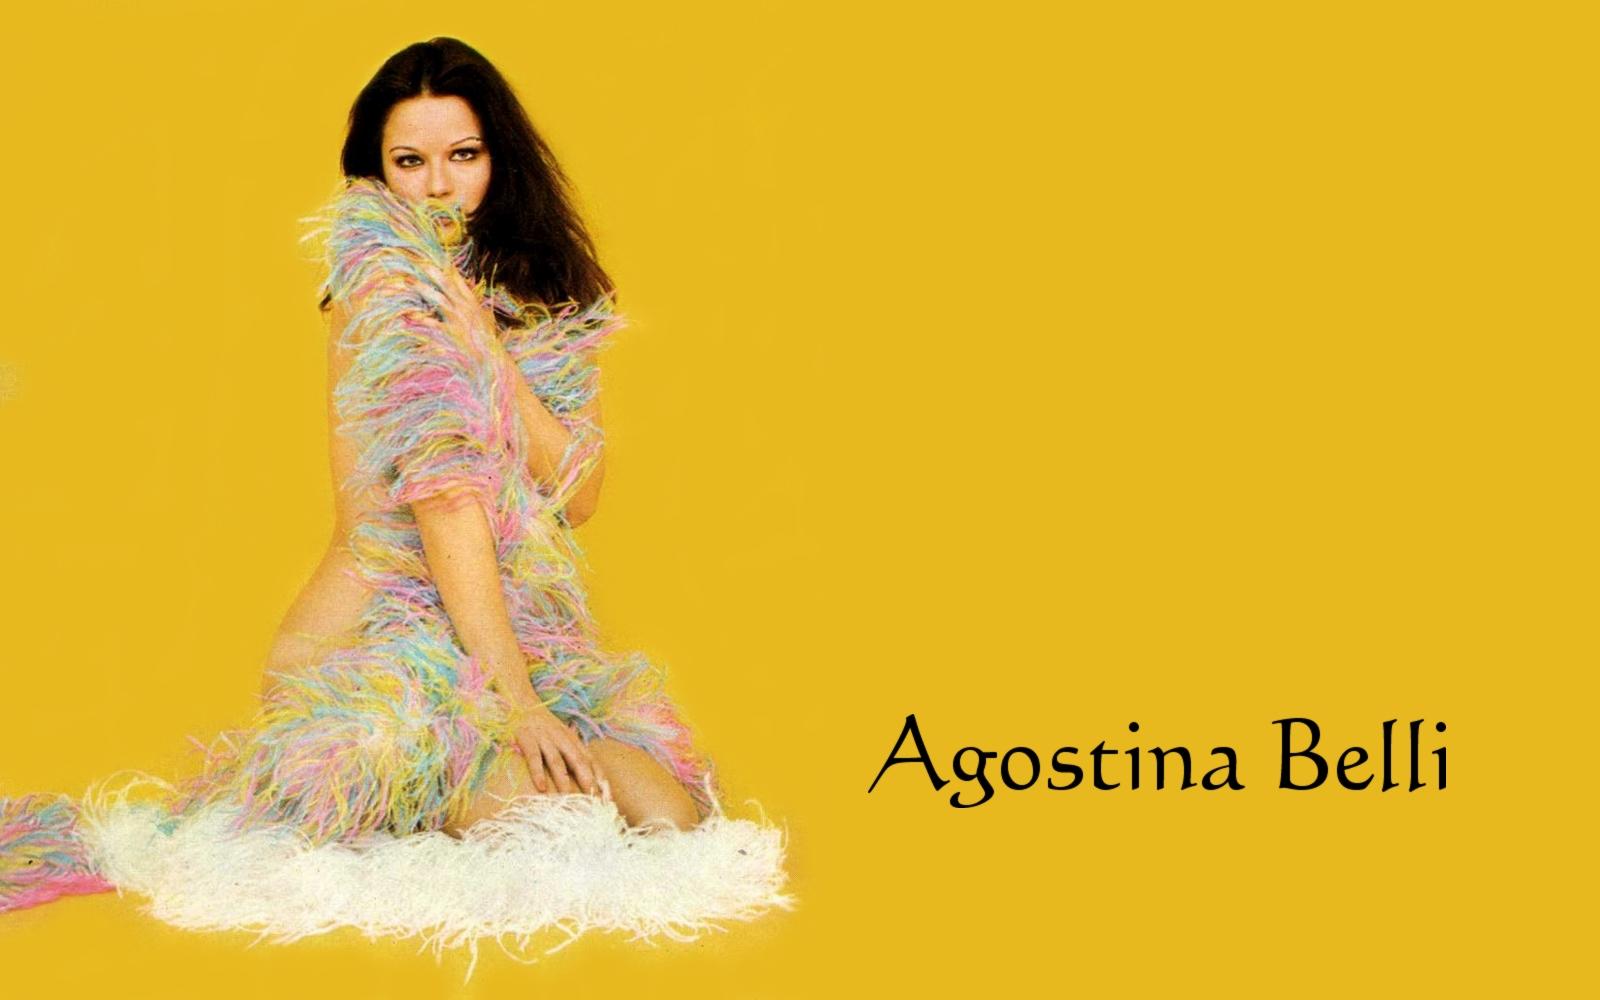 http://1.bp.blogspot.com/-RxwIqiEIQUI/T3gtpPNSwVI/AAAAAAADzlI/hJSVKlpys6Q/s1600/Agostina%2BBelli%2BWallpaper%2B04.jpg